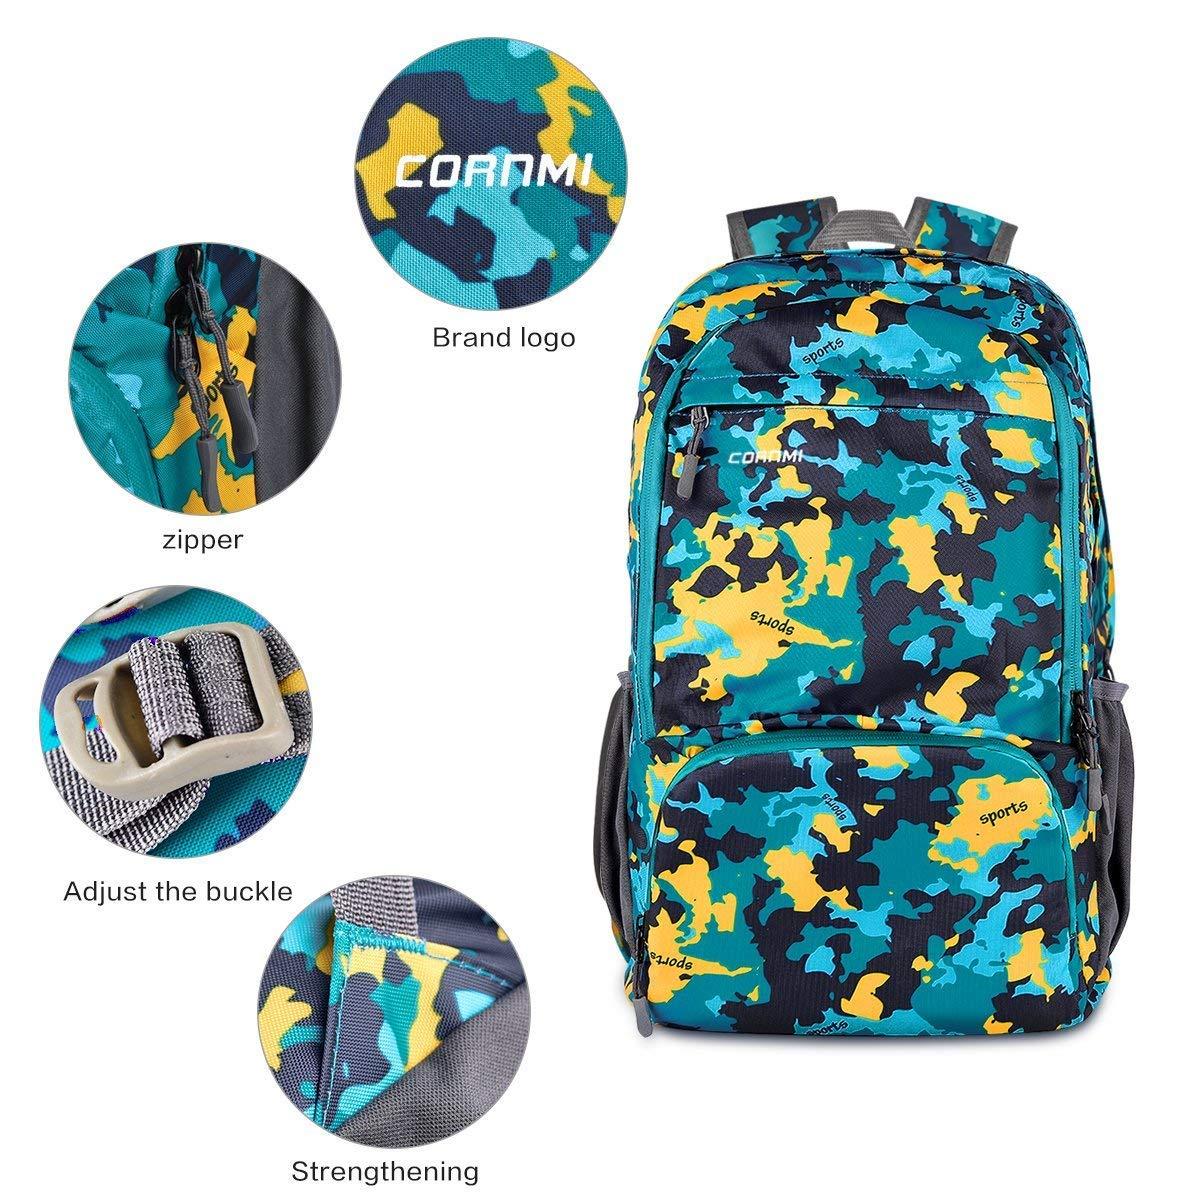 Outdoor Backpack Hiking Backpack Waterproof Foldable Travel Bag Daypack Bag for Beach//Camping//Trip//School//Sport//Mountaineering